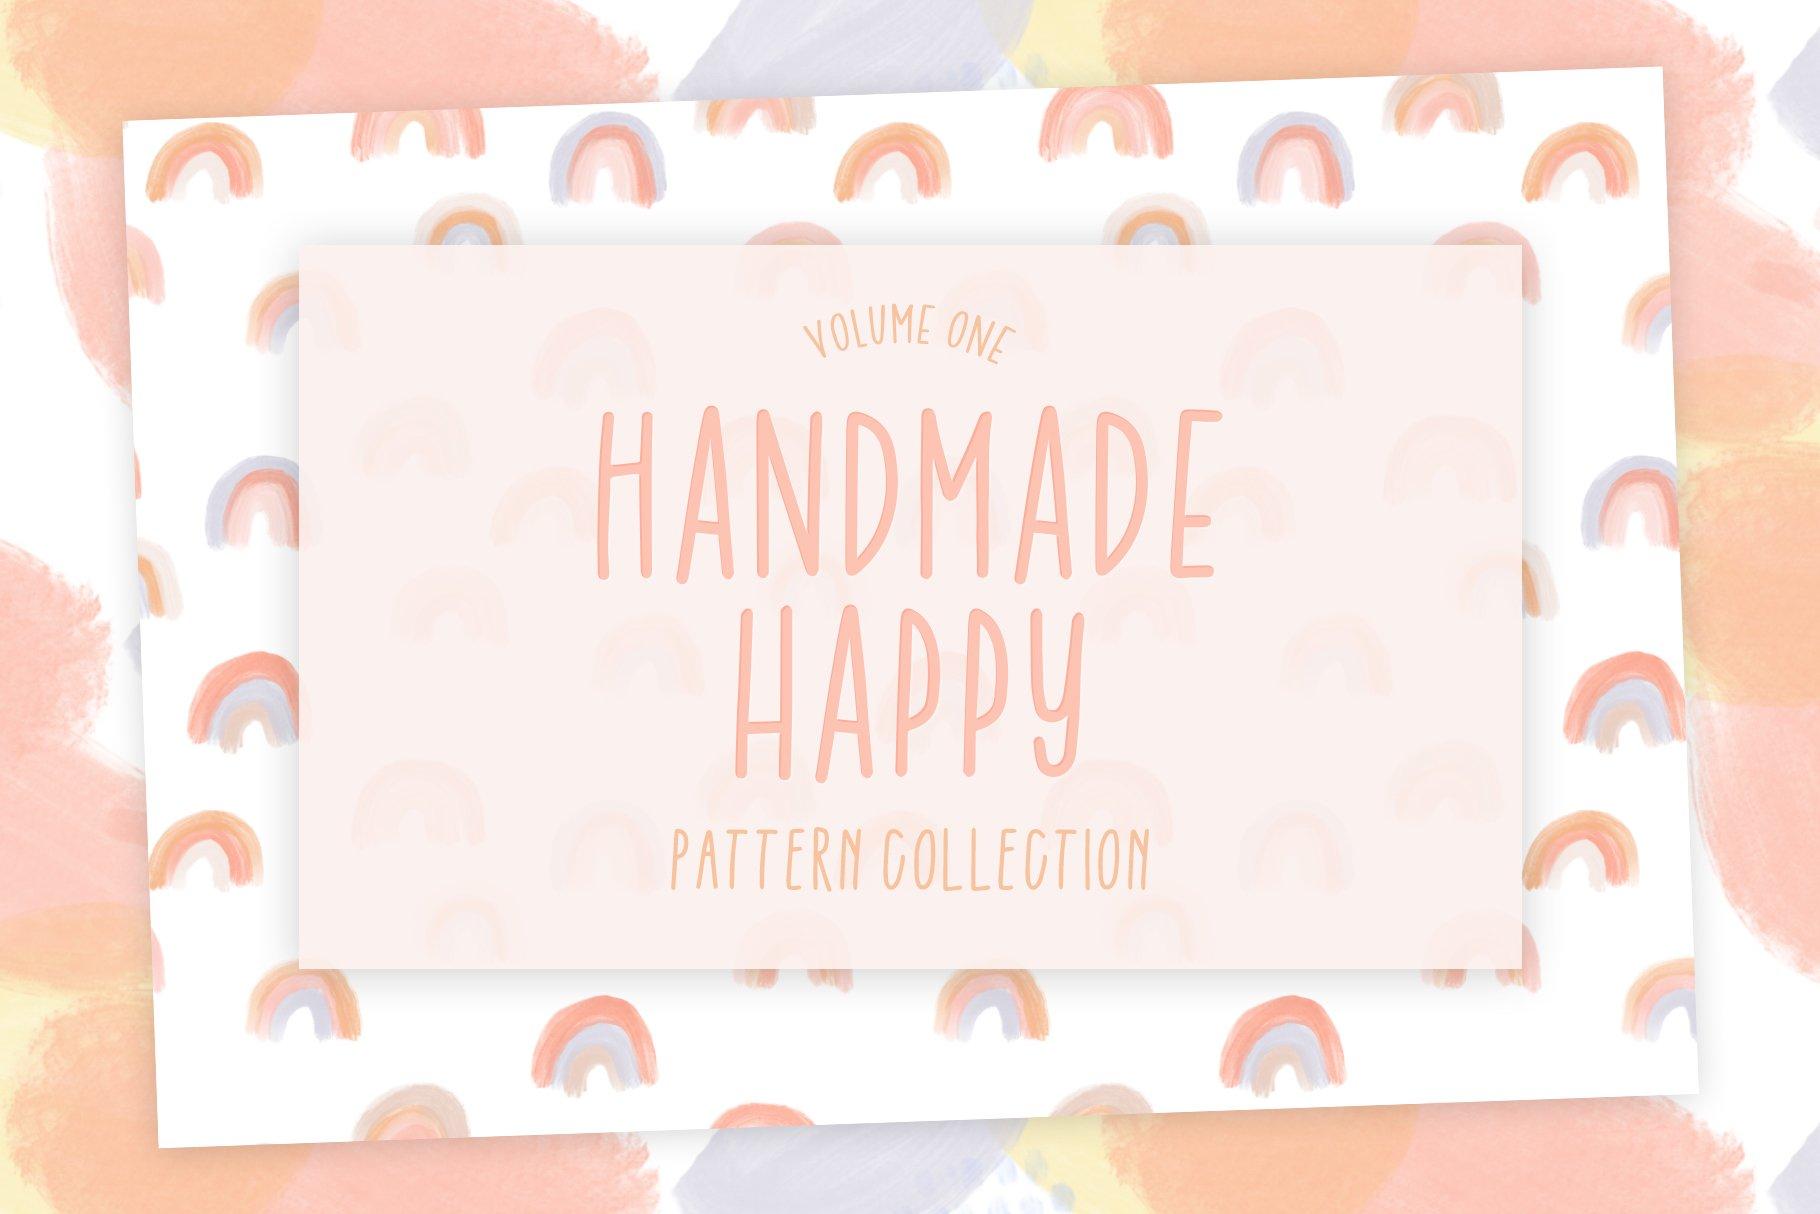 Handmade Happy! Vol. 1 | Pattern Set example image 1